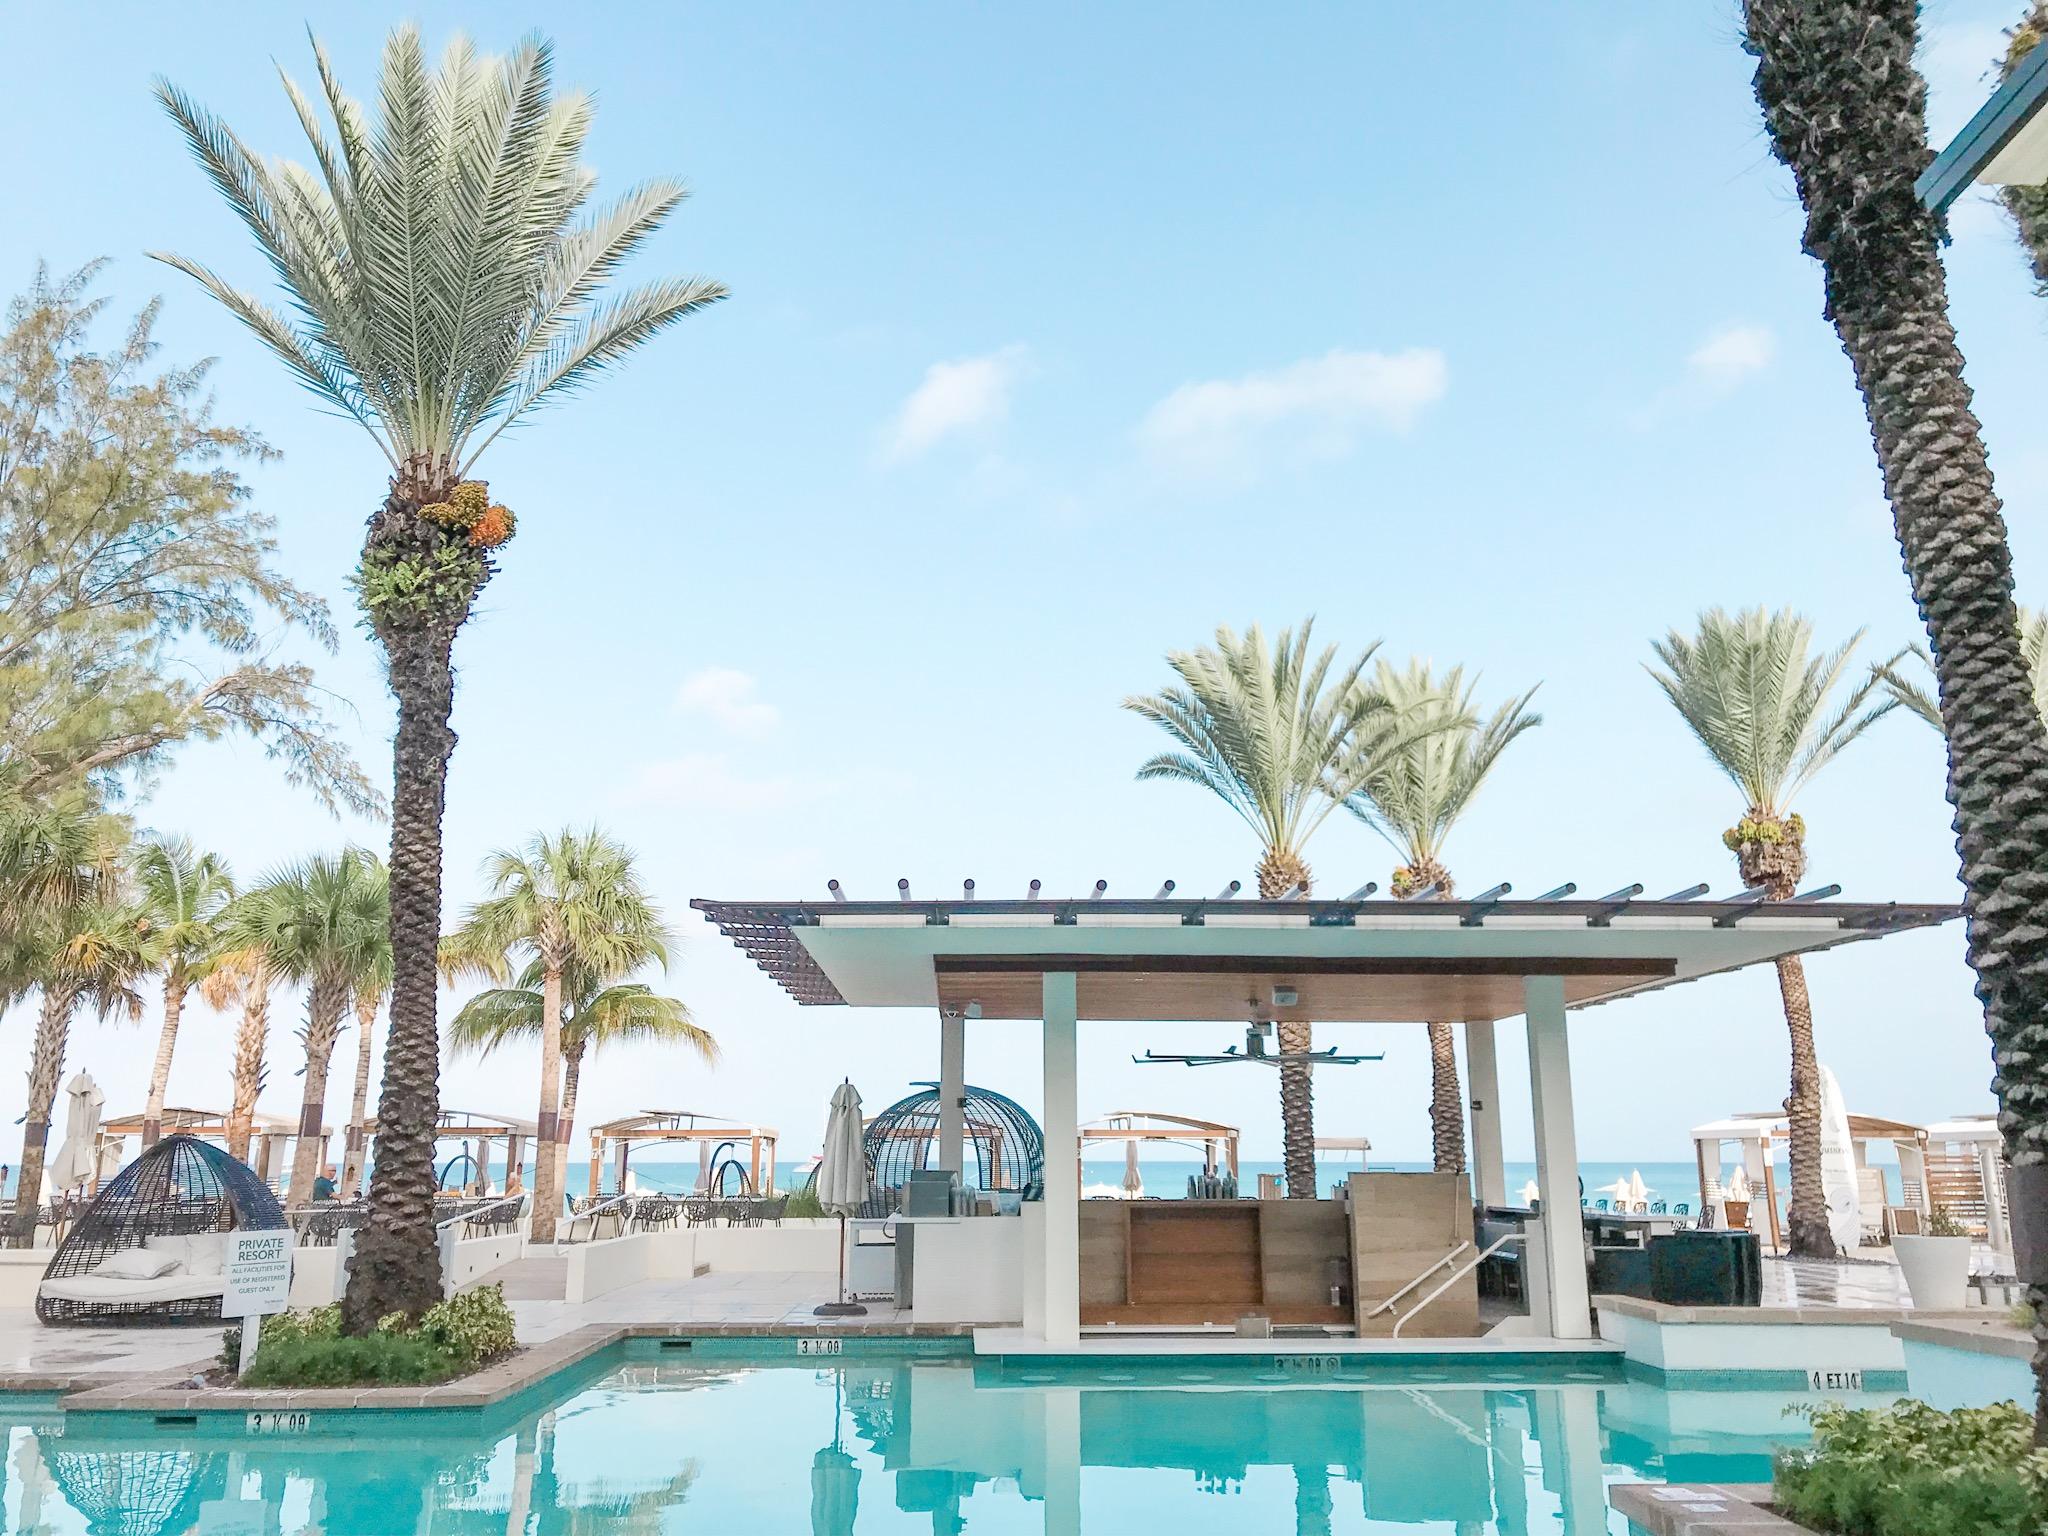 Westin grand cayman, Westin cayman, resorts near Seven mile beach